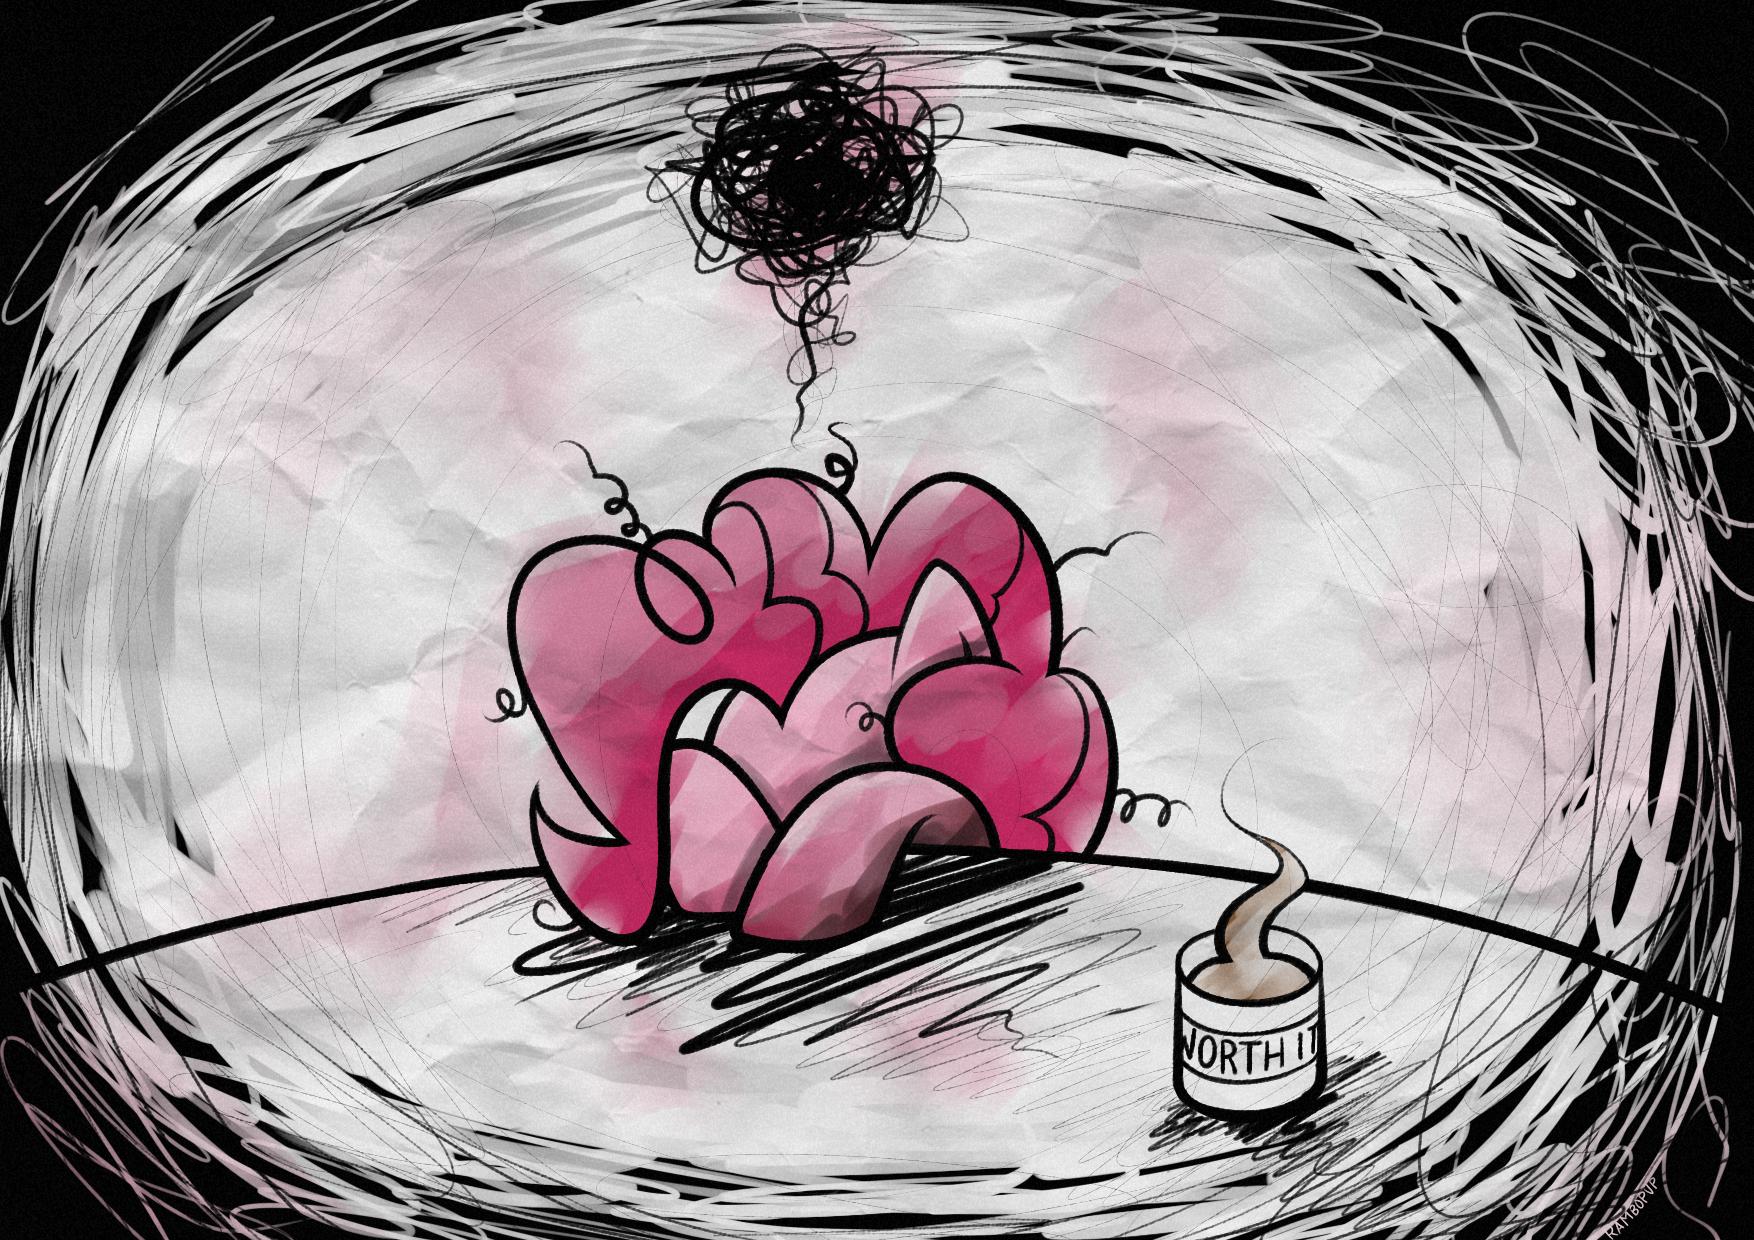 Pinkamena Hangover Pie by Rambopvp